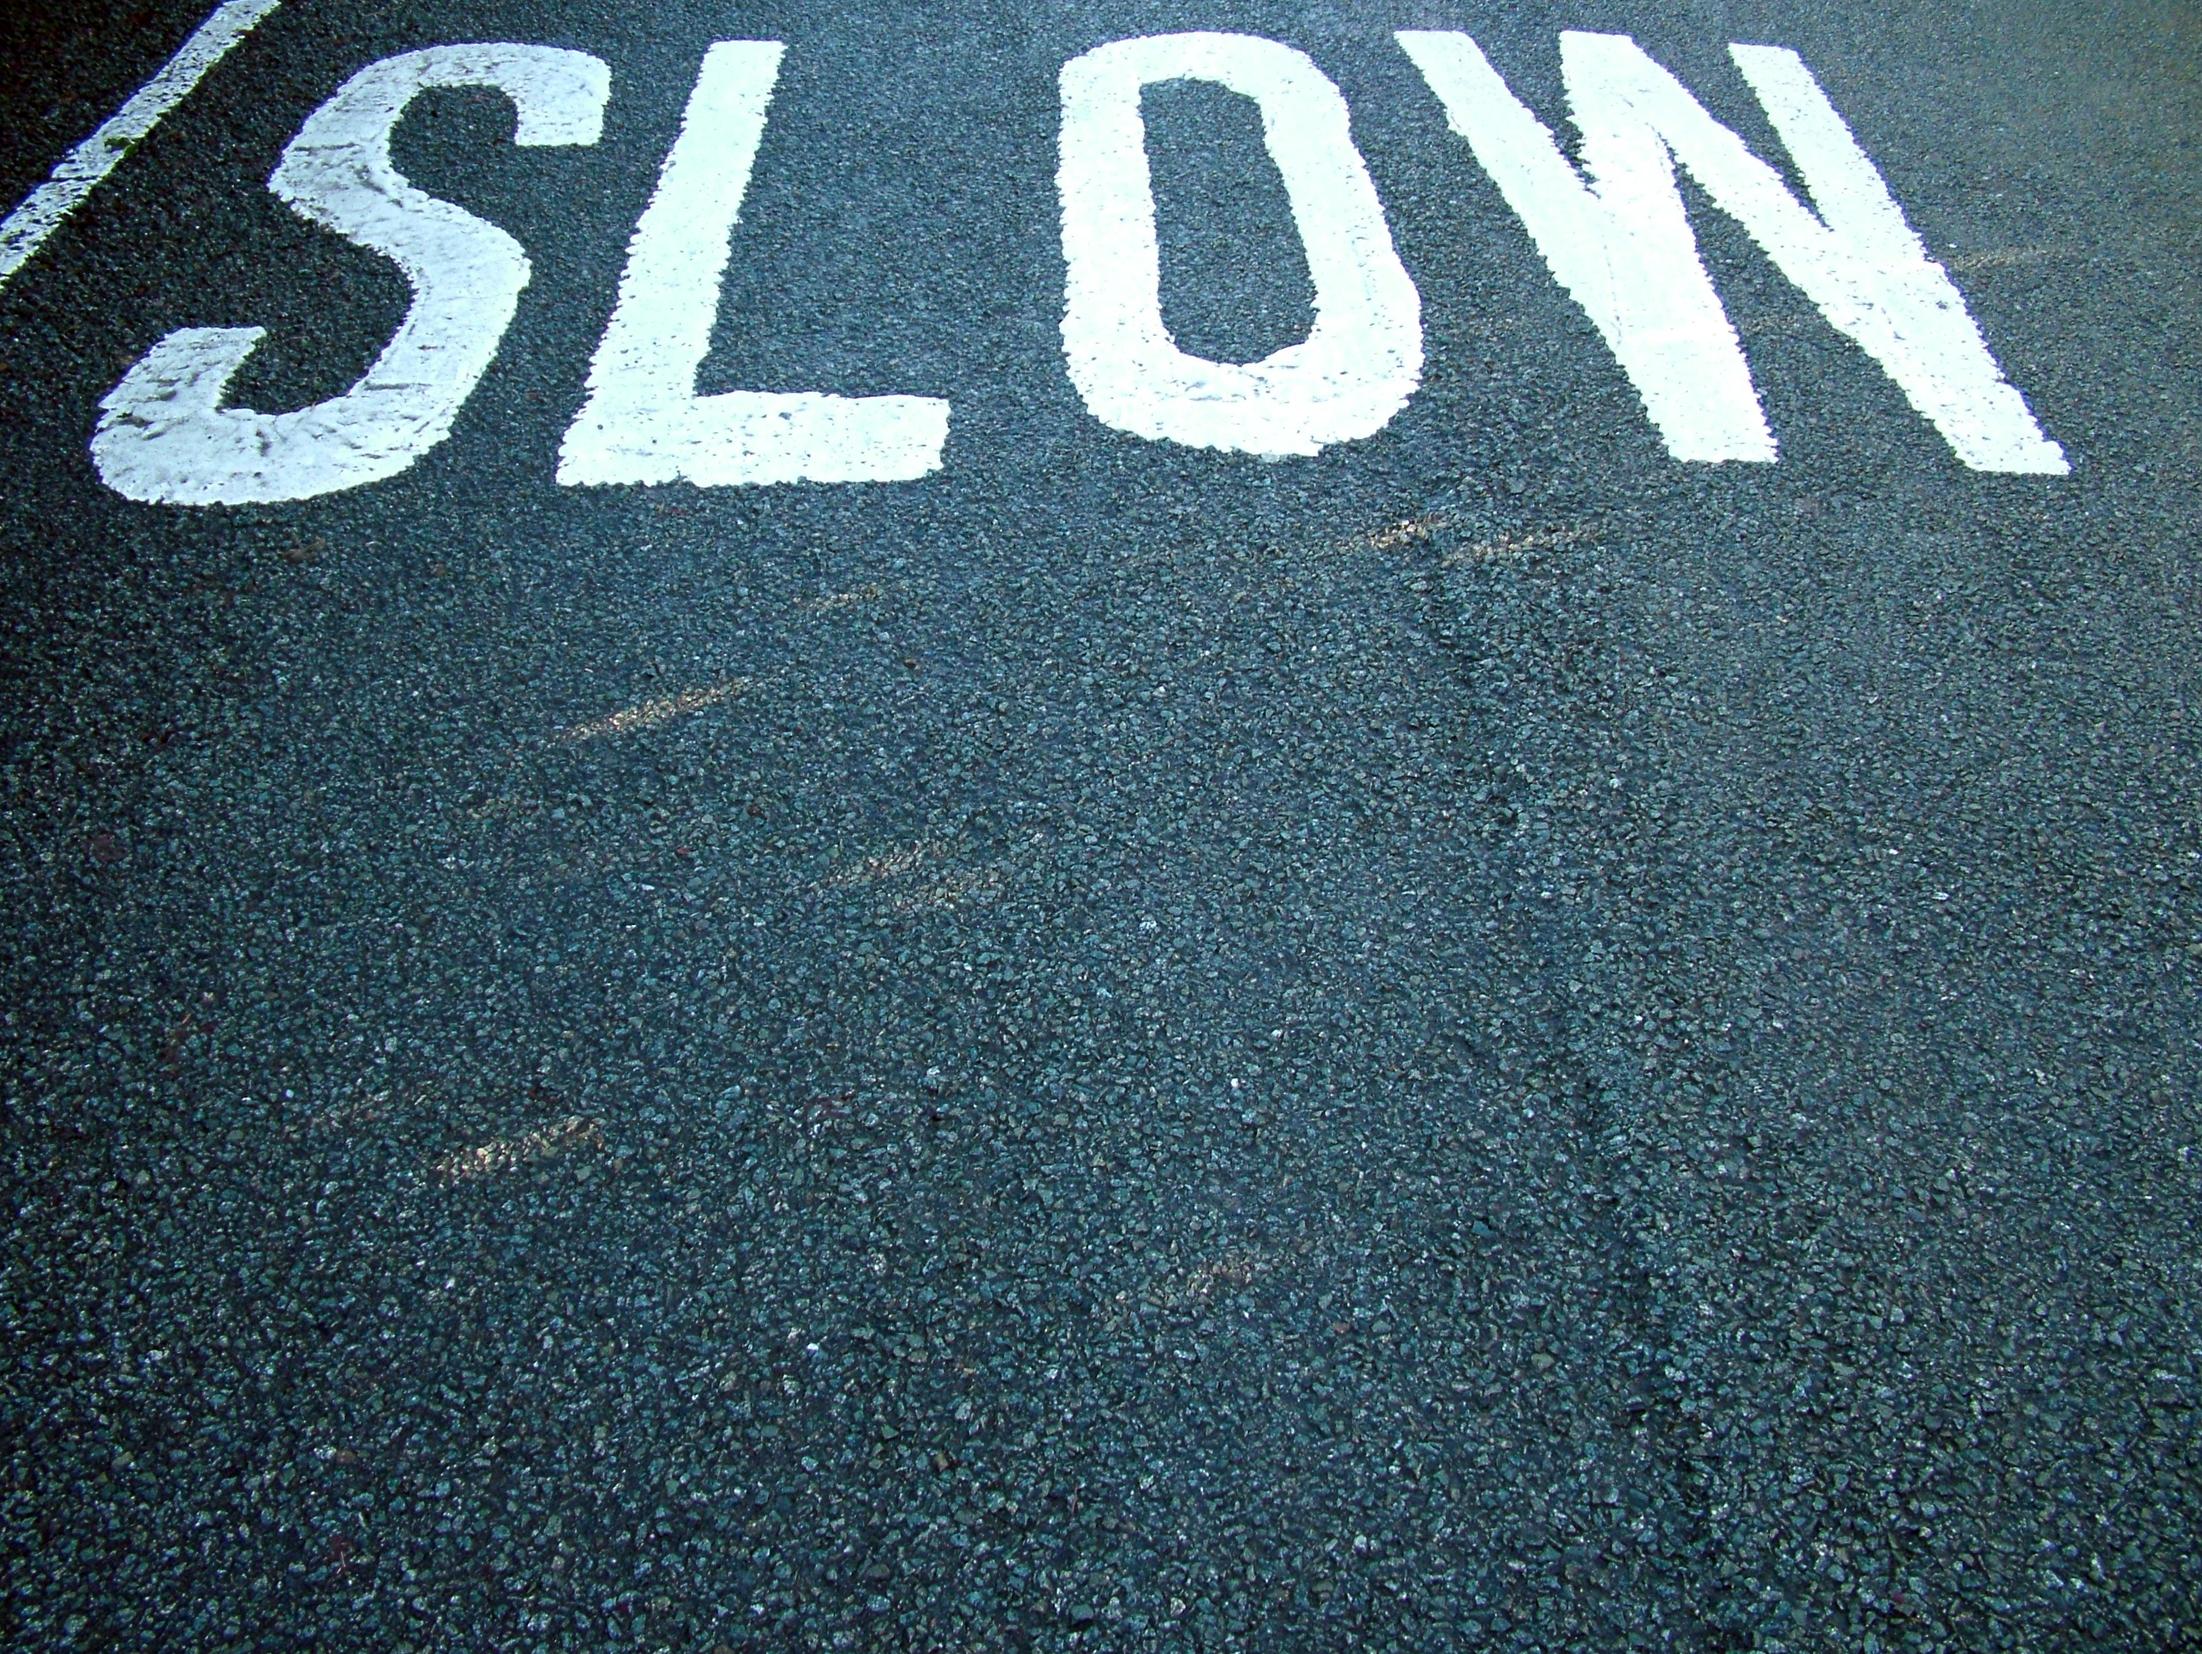 Slow economic growth in last quarter of 2010